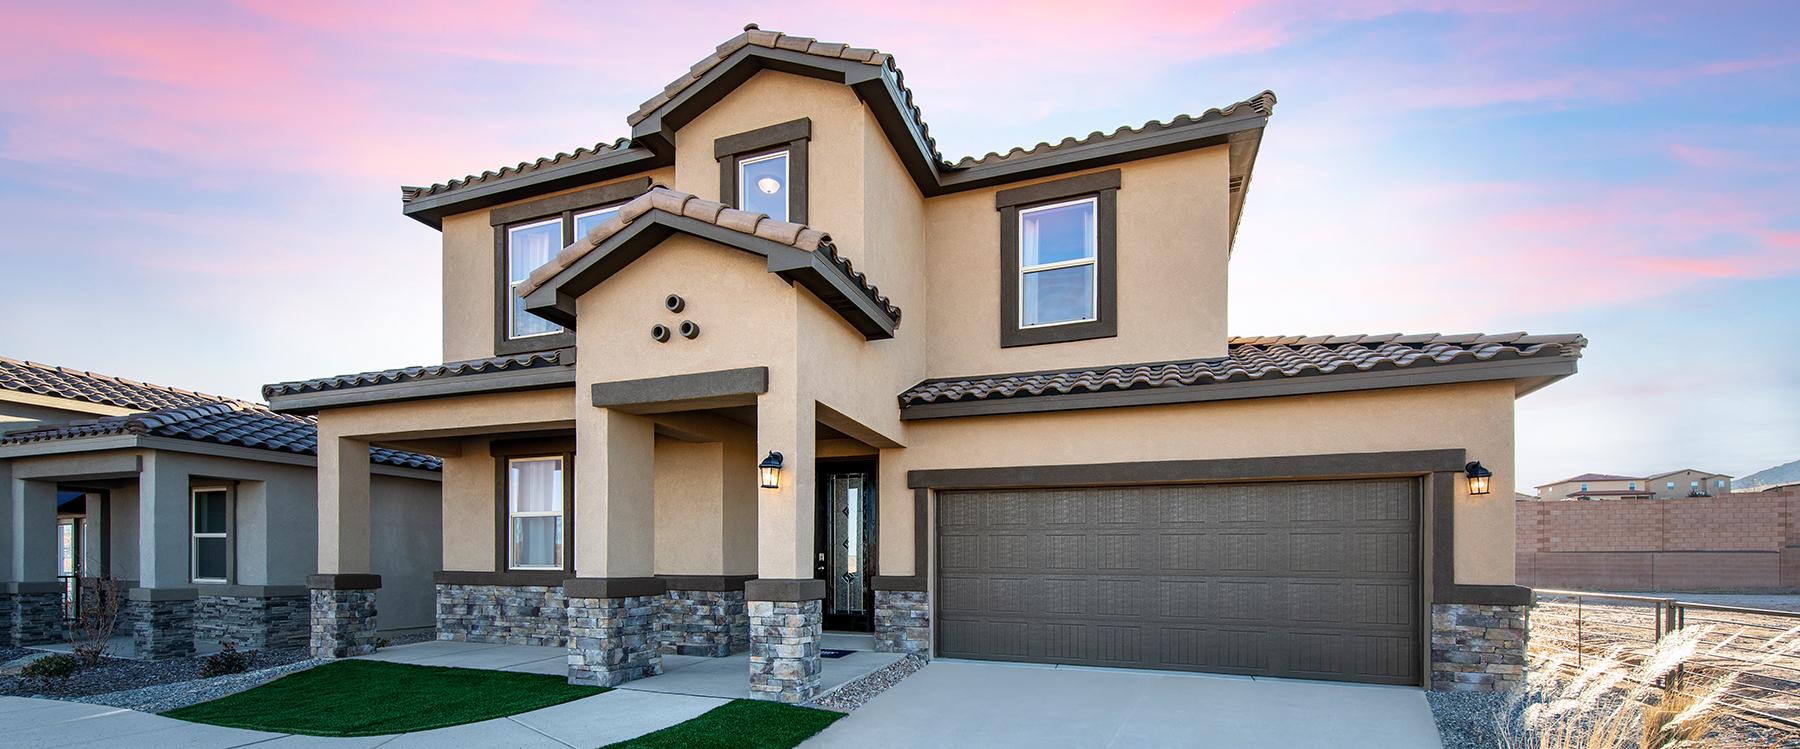 America's Largest Homebuilder | D R  Horton